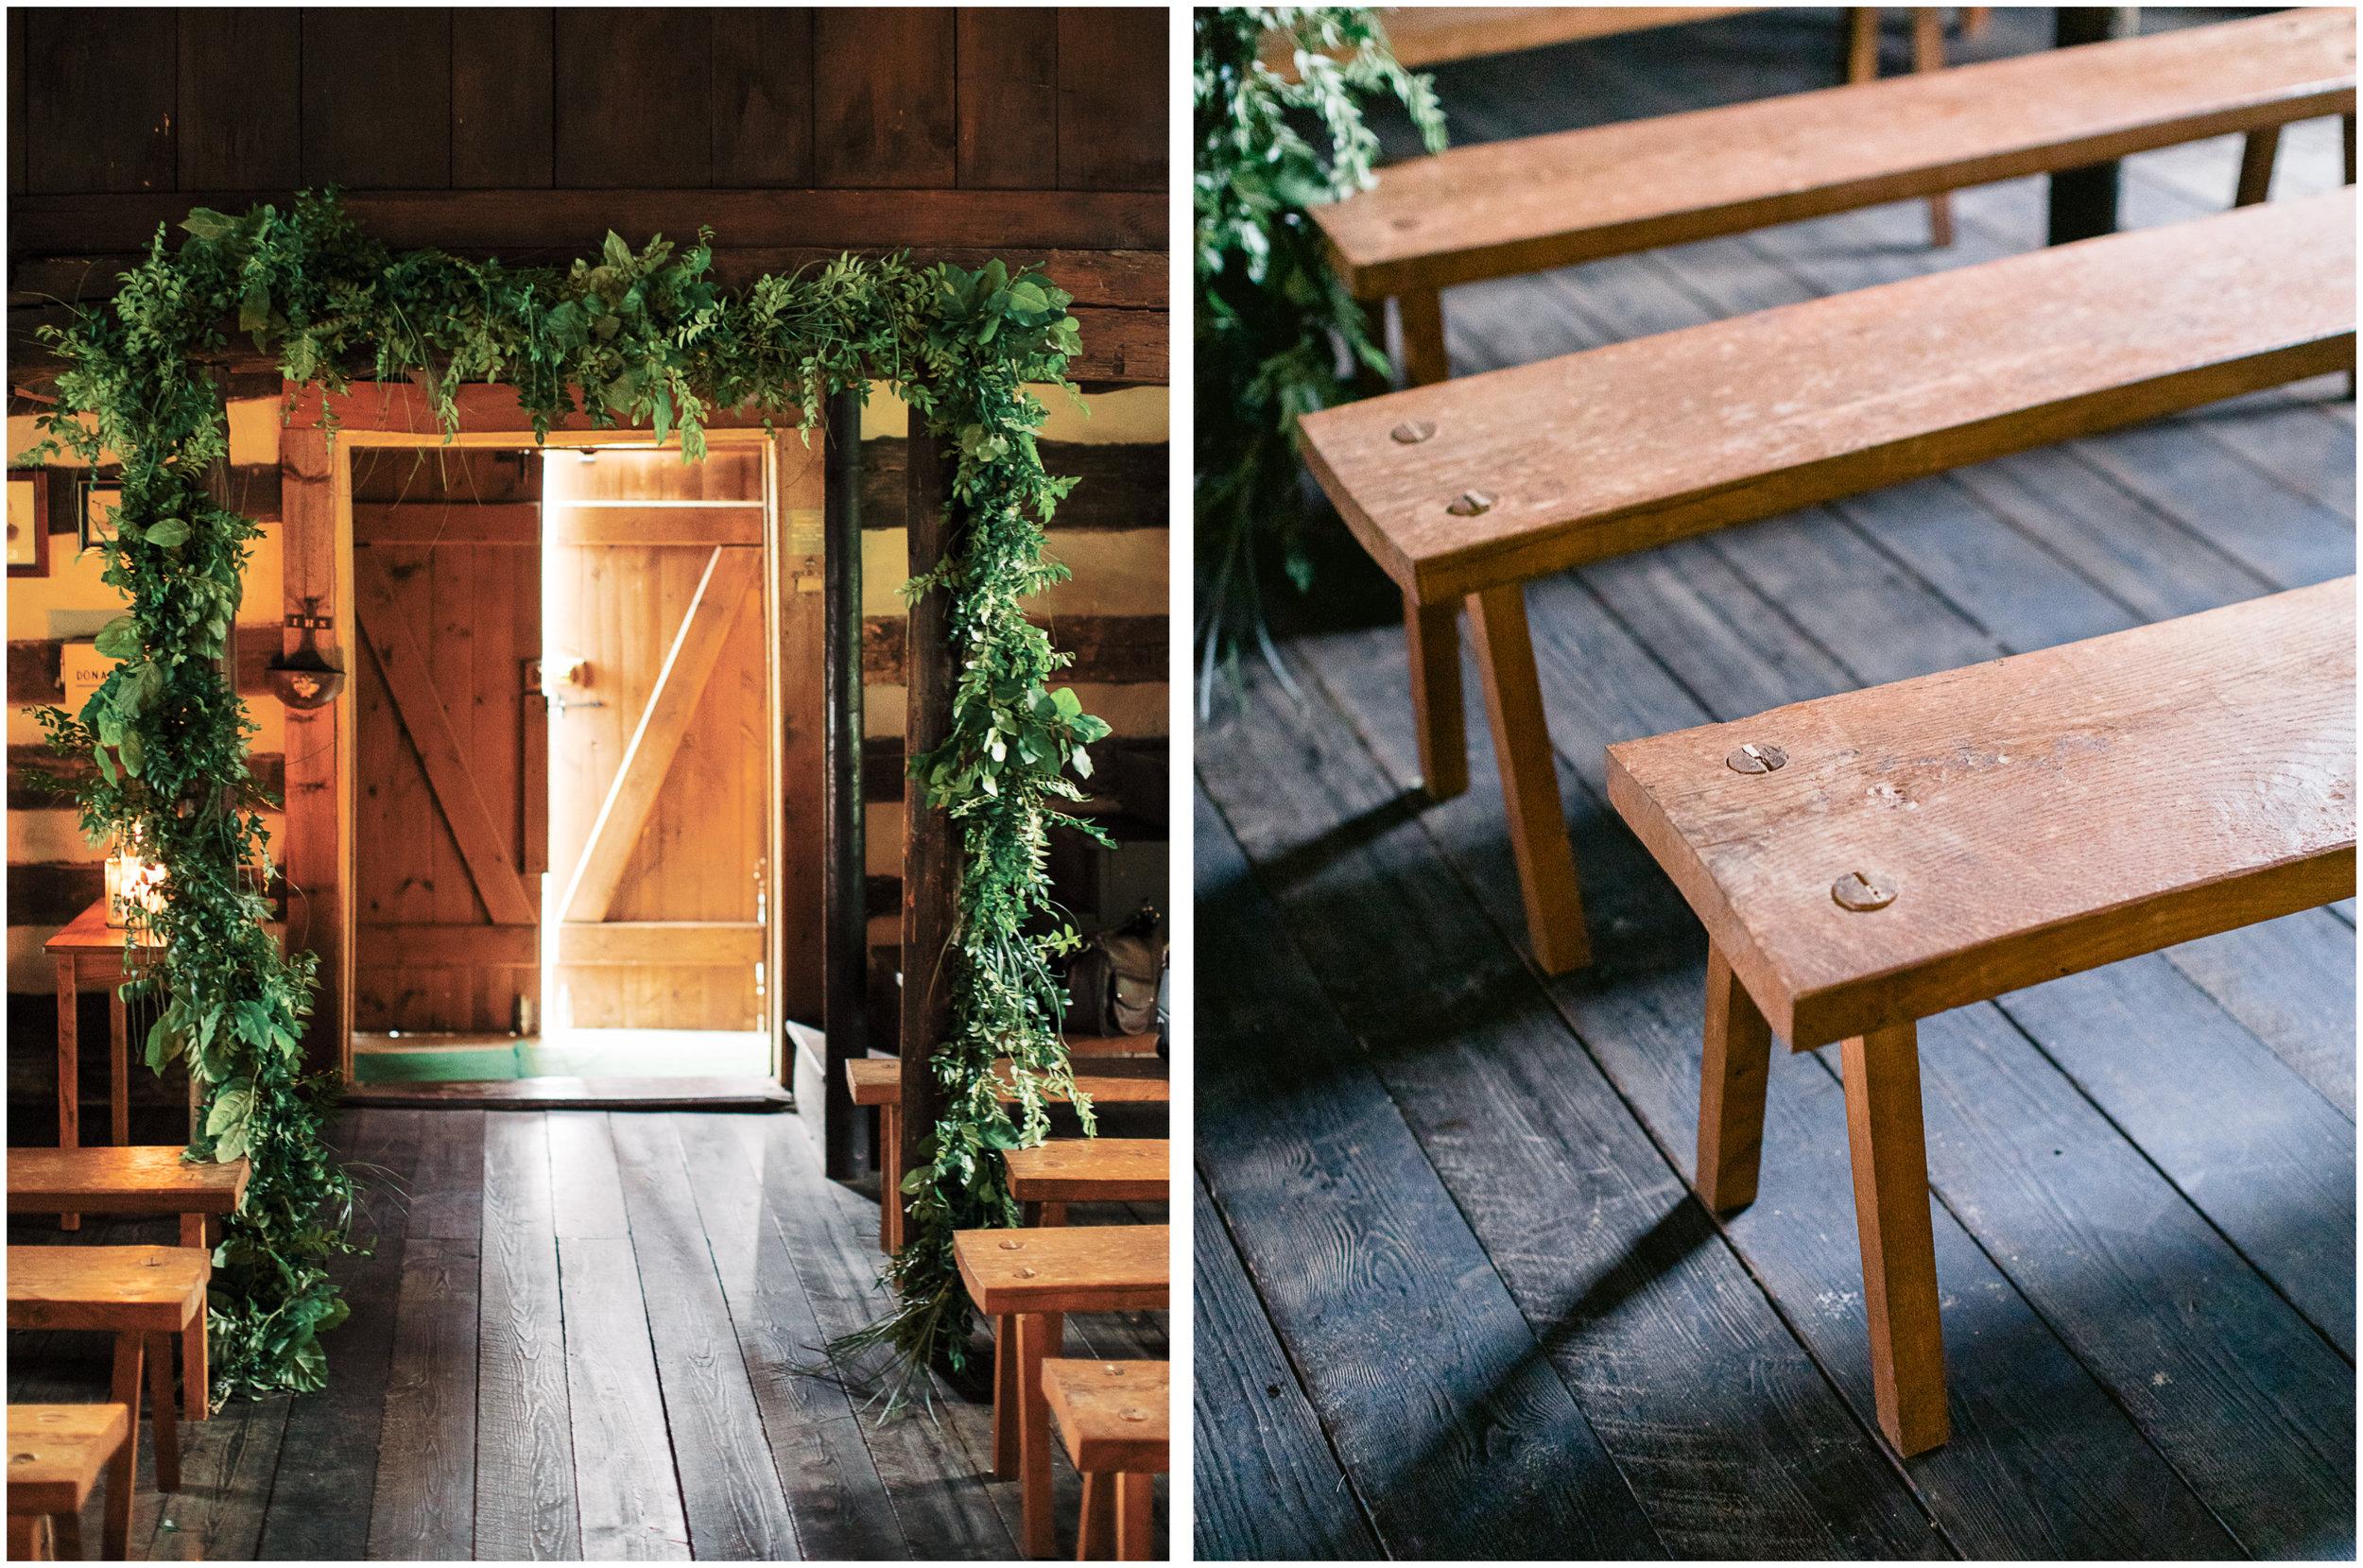 pittsburgh-wedding-photographer-intimate-garden-wedding-bumbleburgh-pennsylvania-elegant-simple-sophisticated-elegant-backyard-wedding-28.jpg